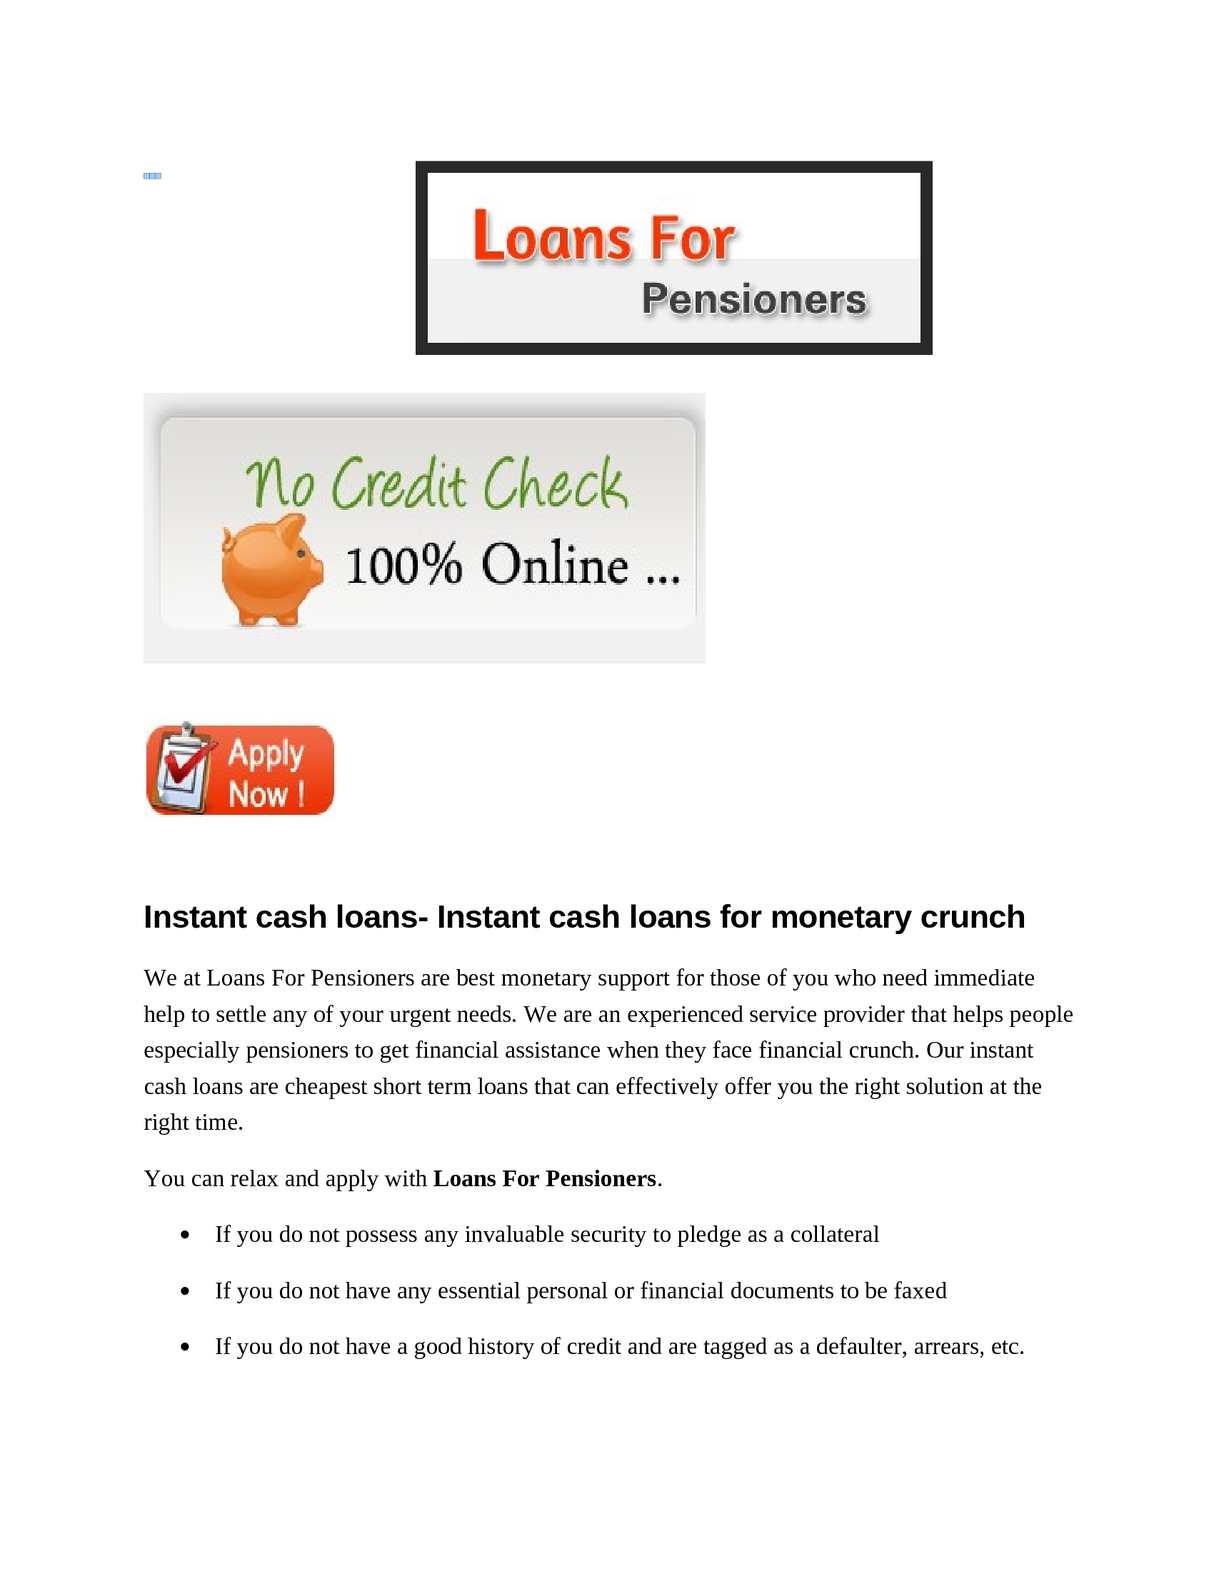 calaméo - instant cash loans- instant cash loans for monetary crunch